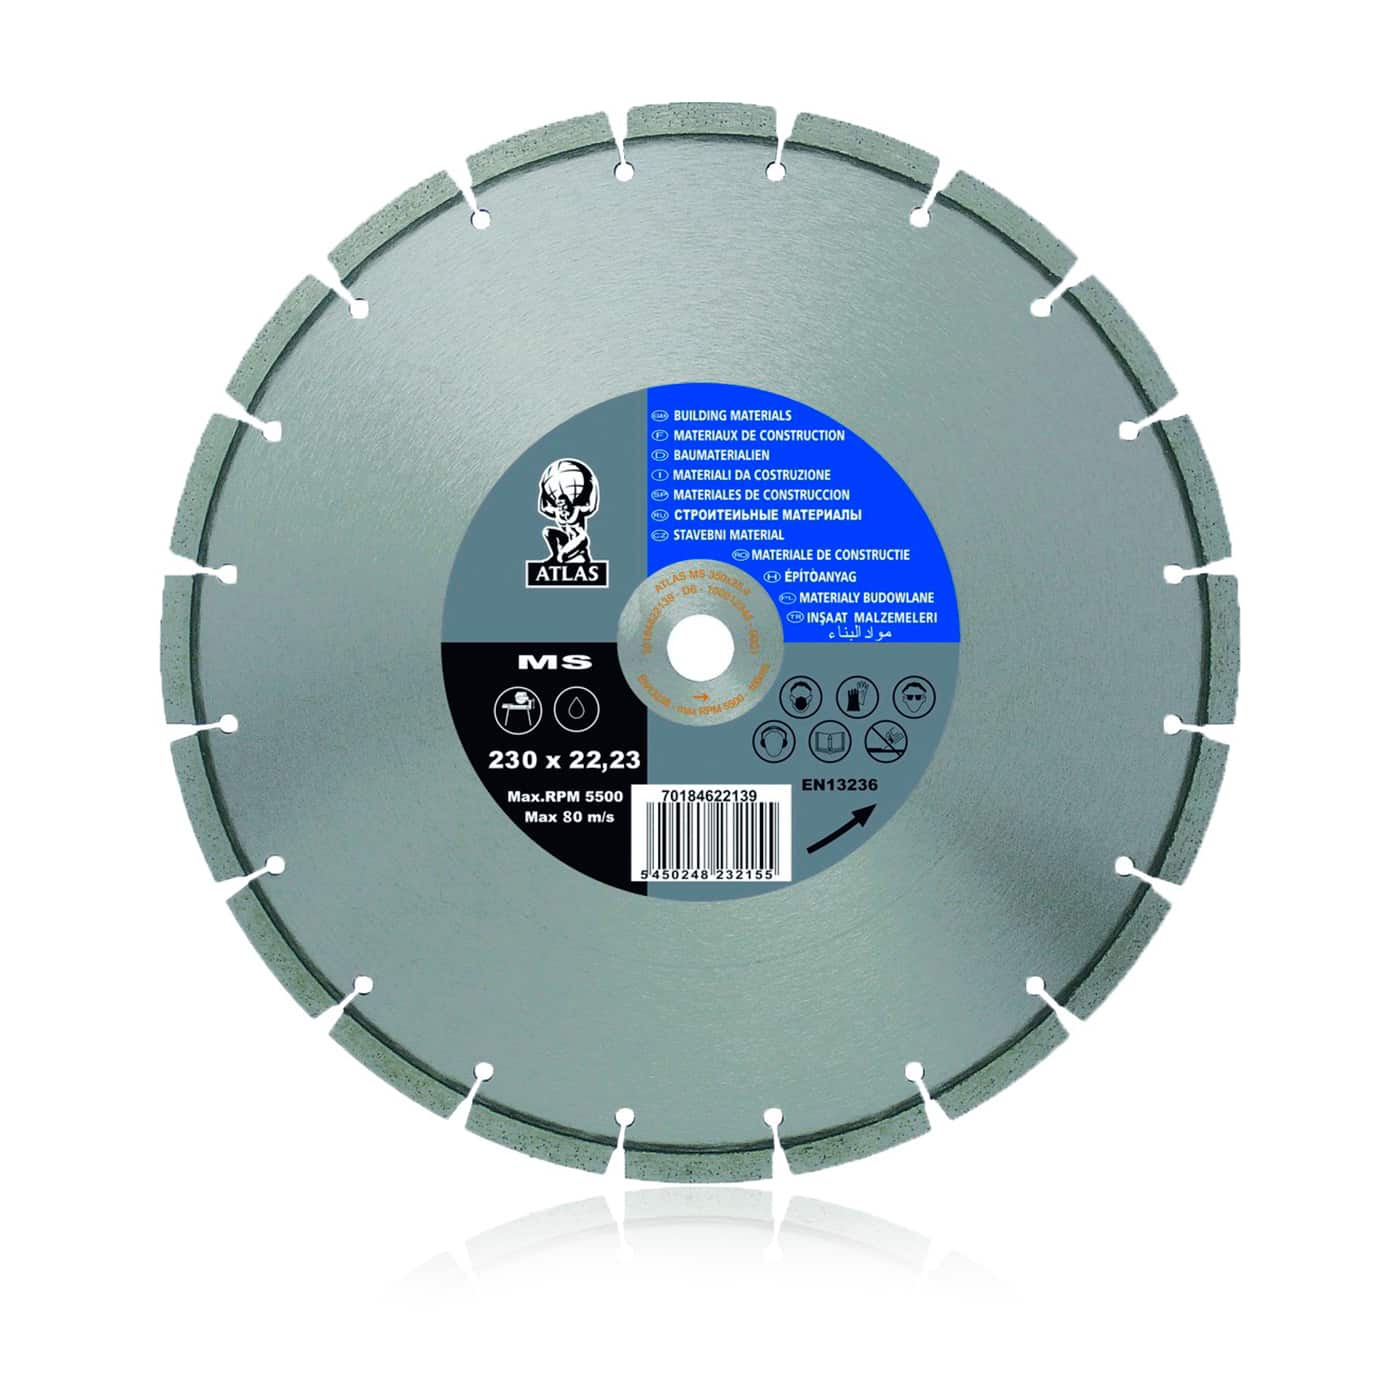 smirdex-917-atlas-universal-diamond-discs sintered segmented blade,precision cut,long-lasting,special desing